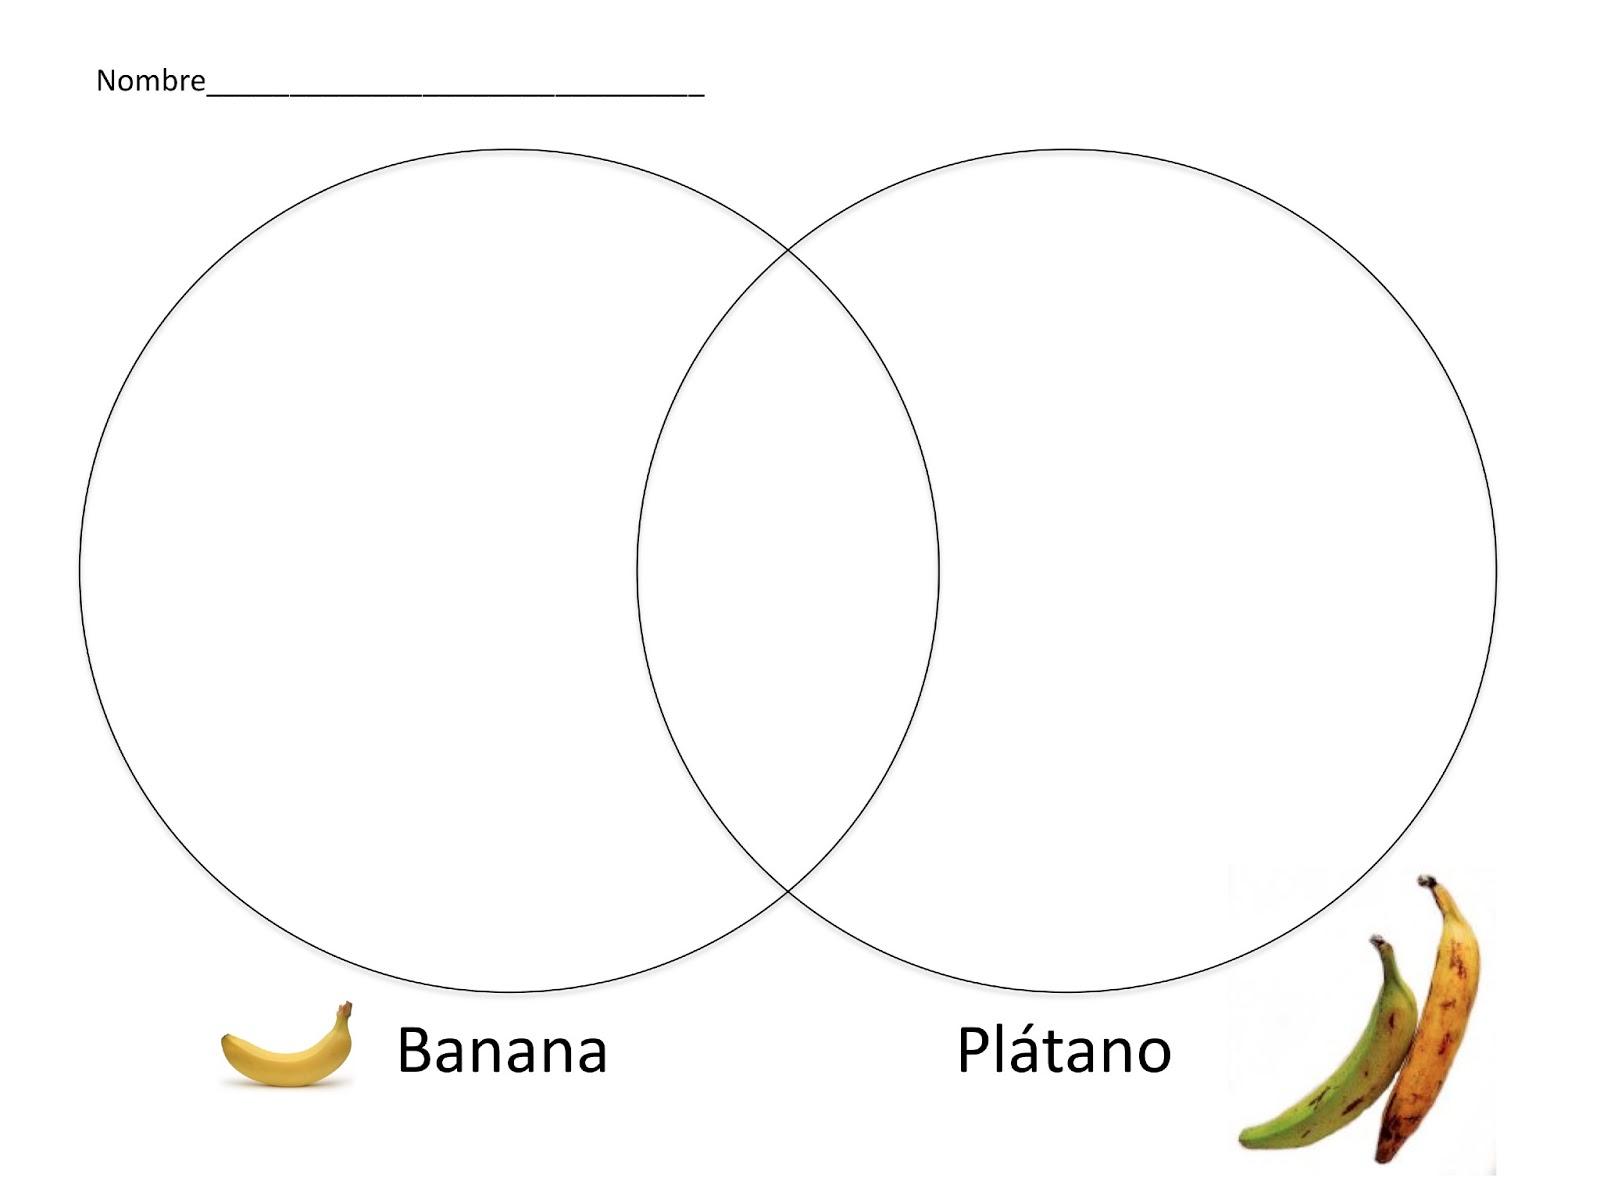 Guineo O Platano Comparing Plantains And Bananas